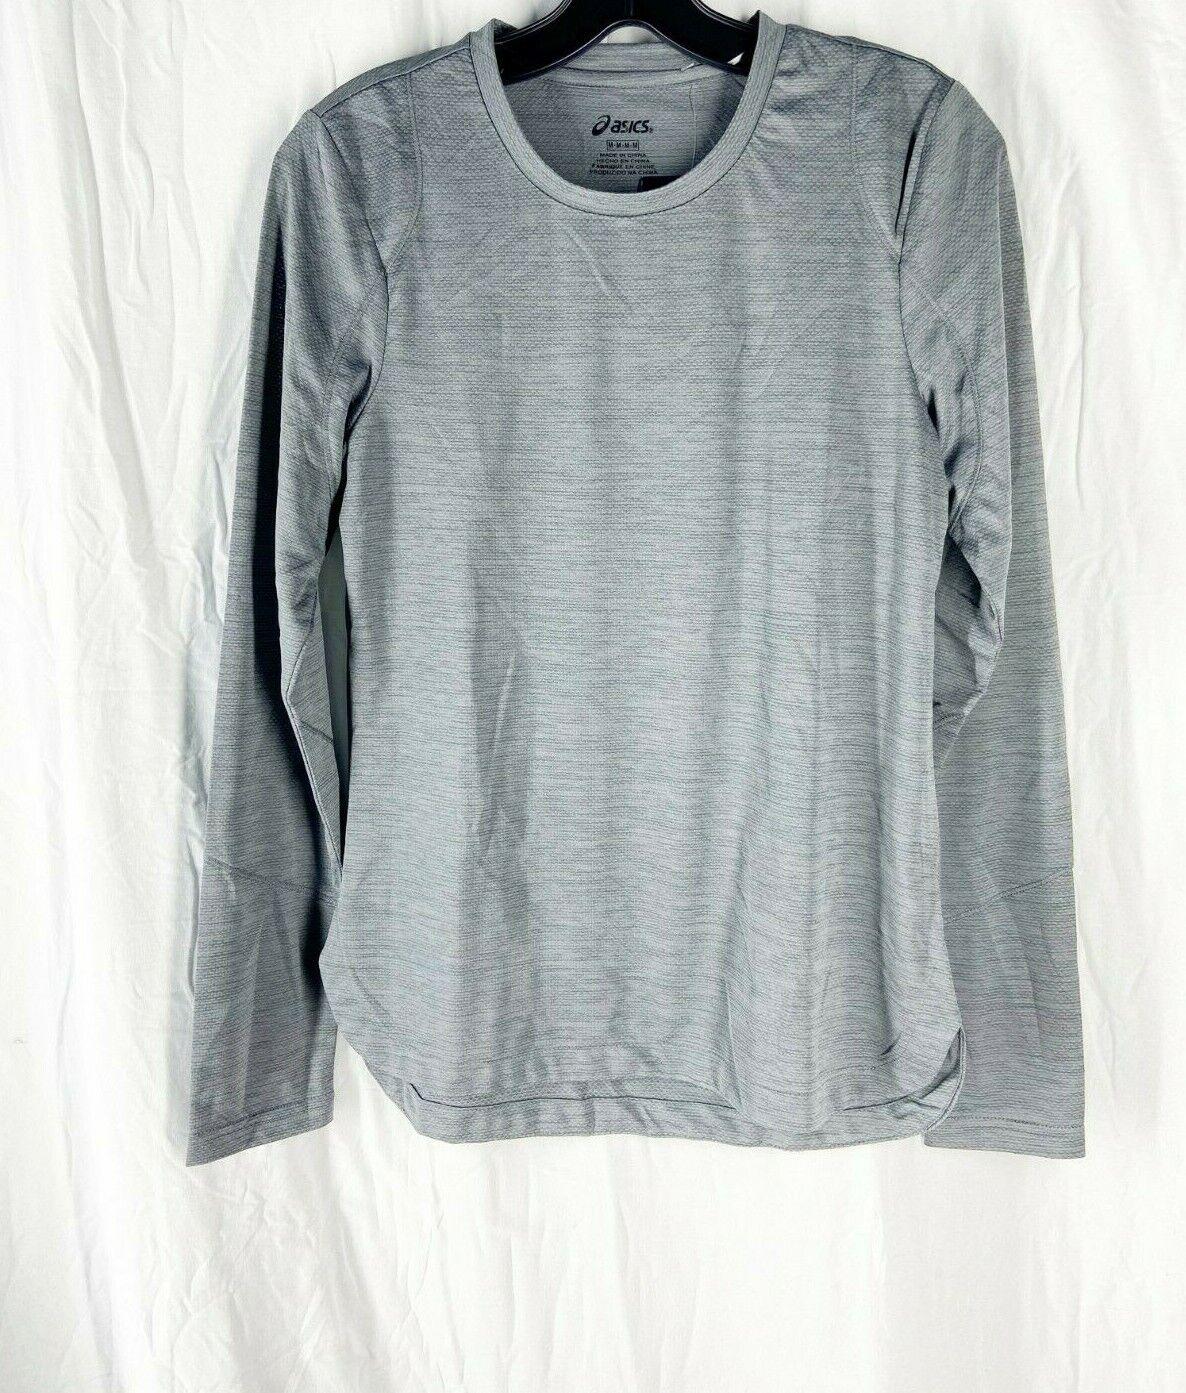 Asics Womens Dark Gray Heather Reflective Training Long Sleeve Top Size M